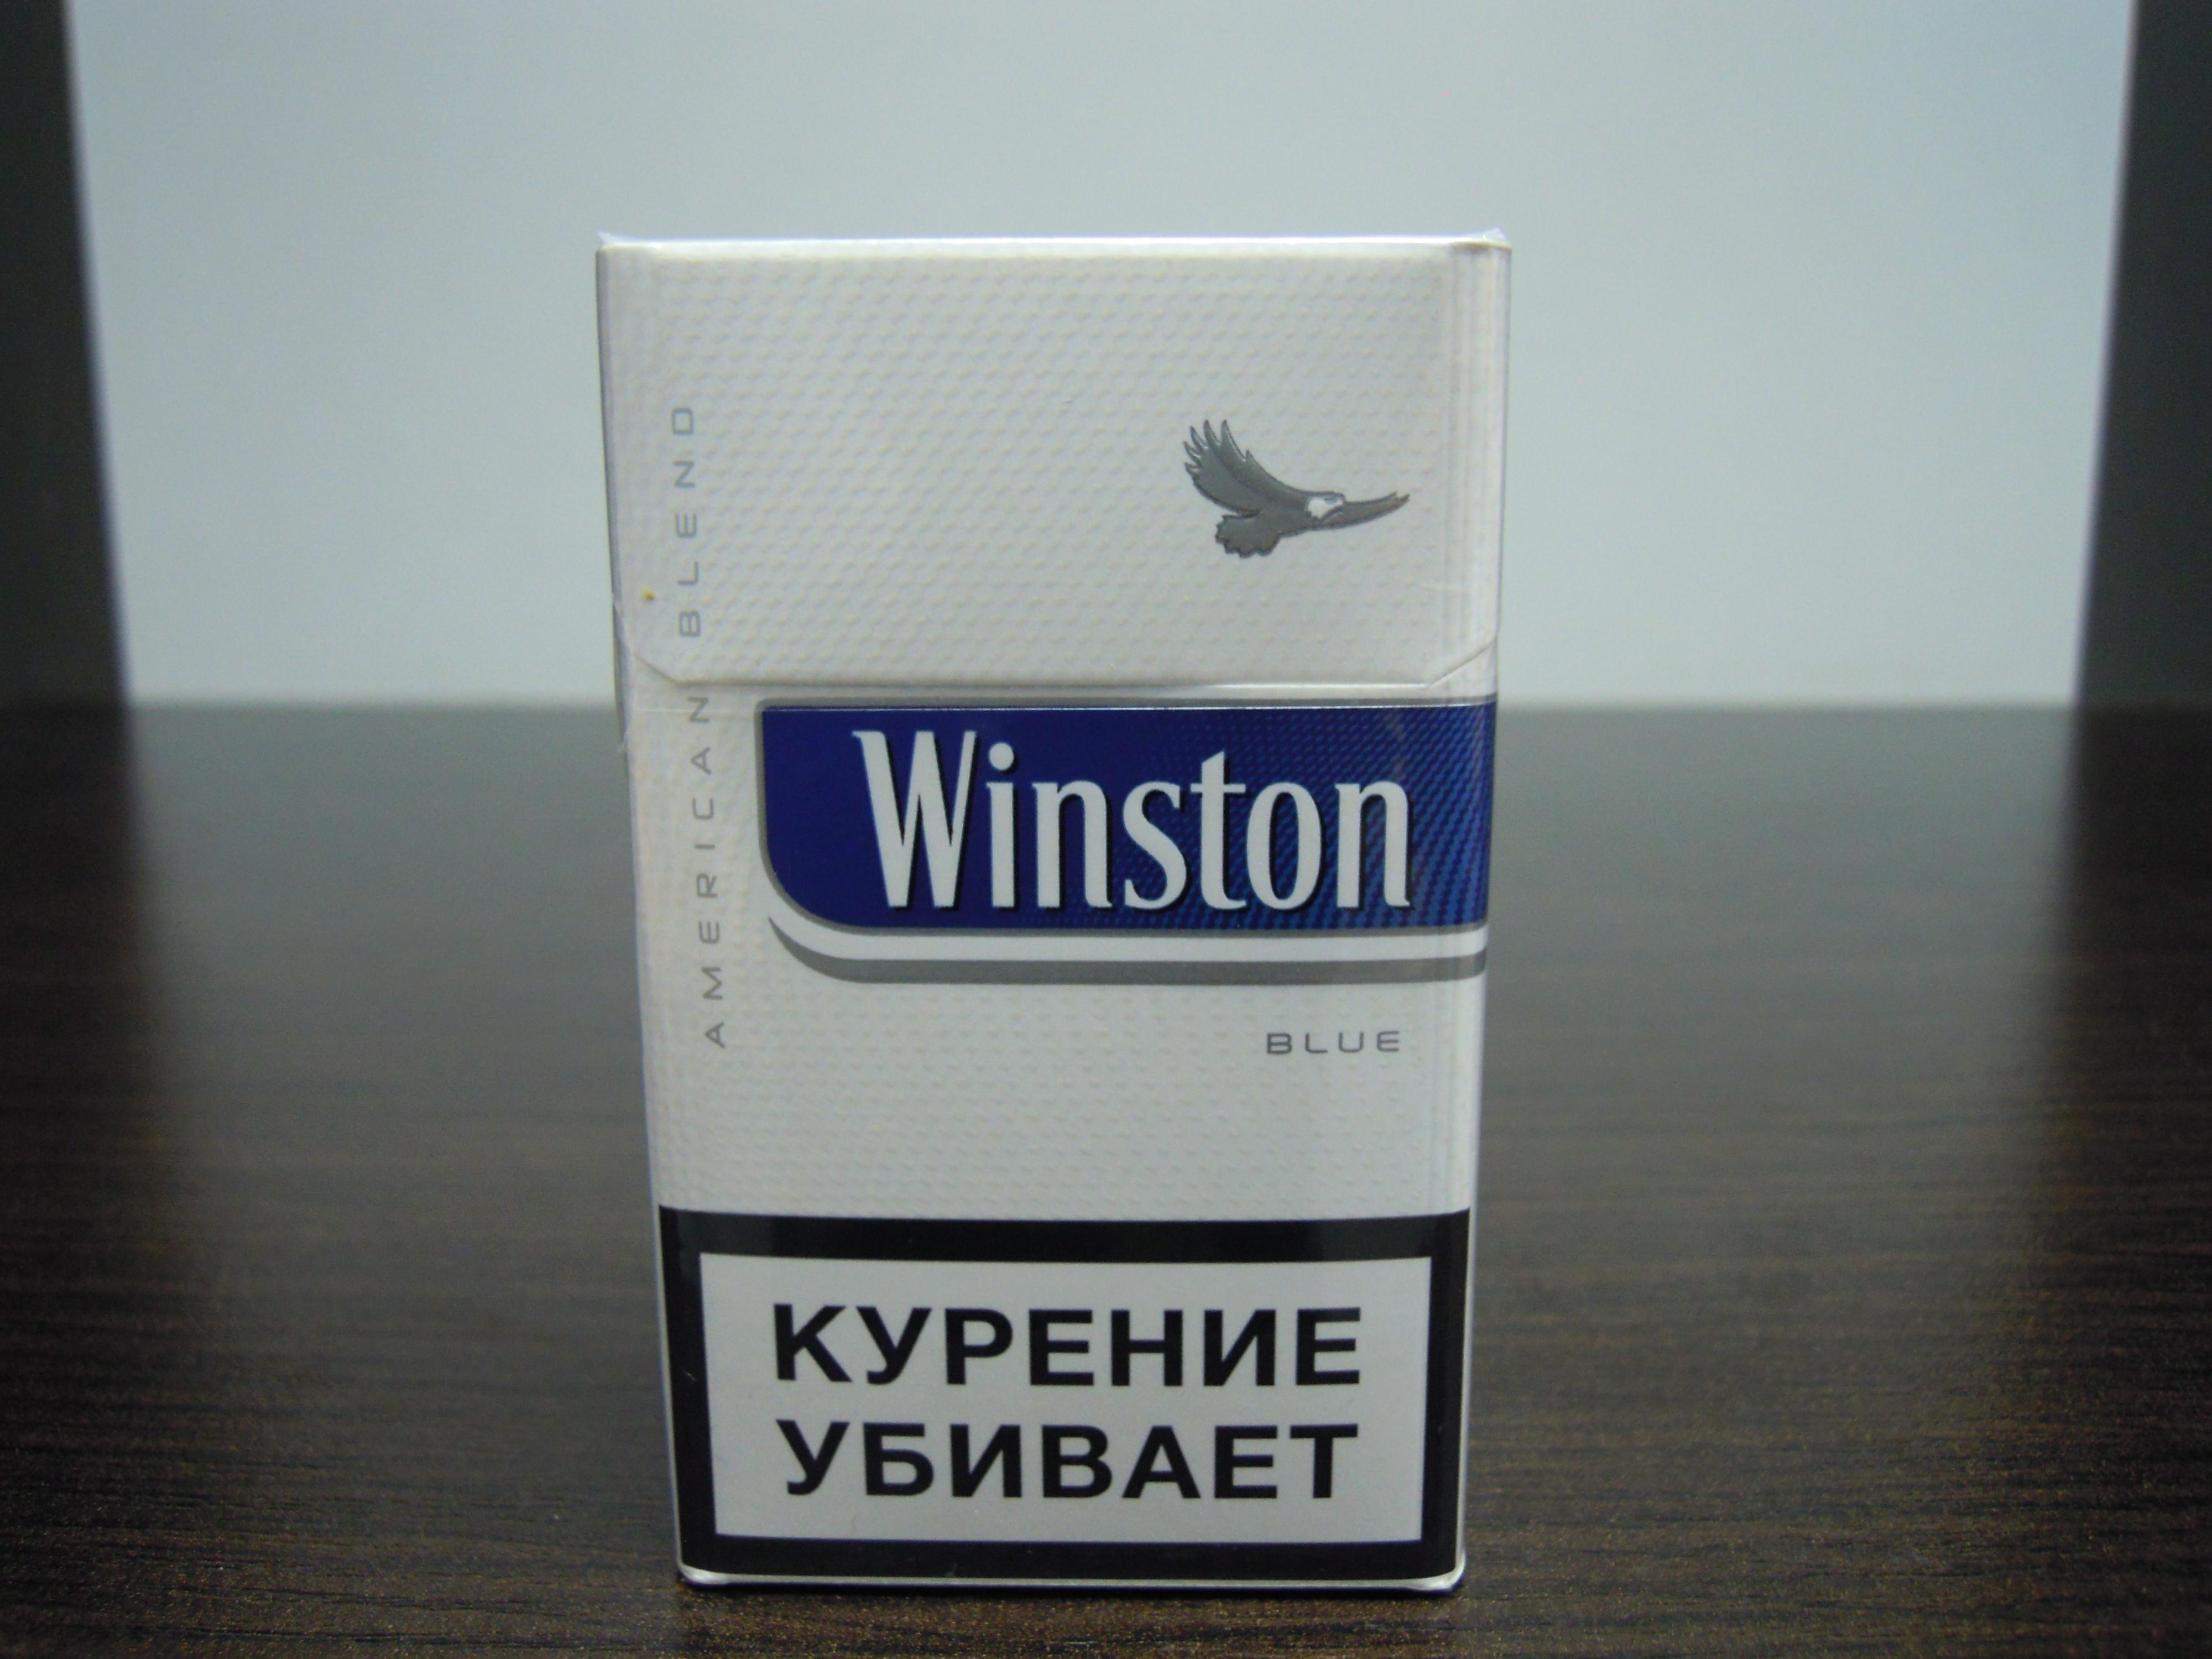 Картинки сигареты винстон, котенок добрым утром